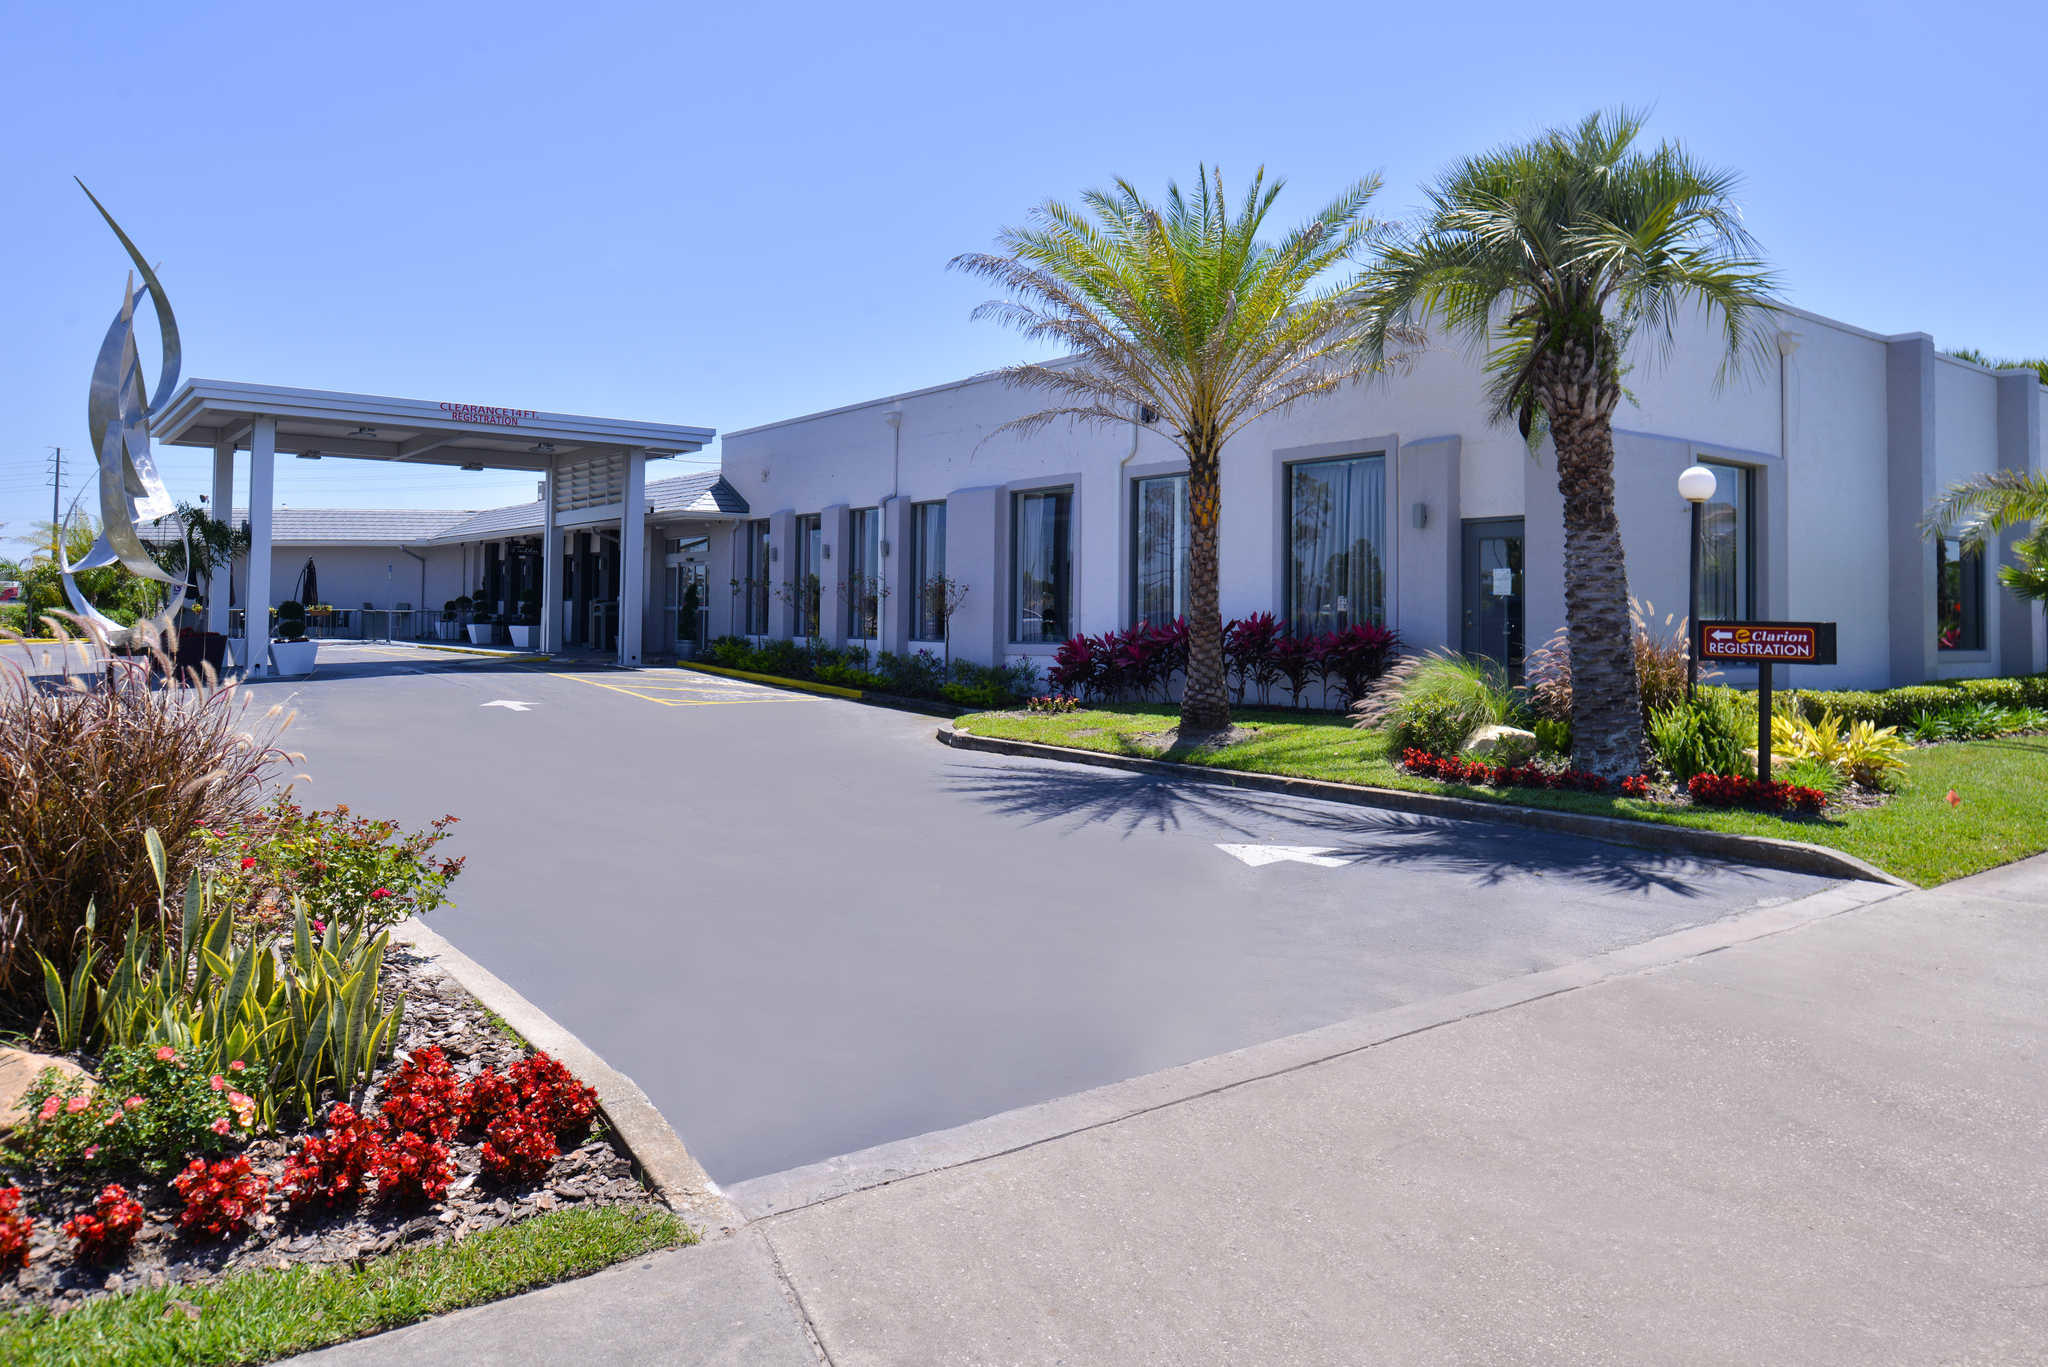 Clarion Inn & Suites Orlando near Theme Parks image 1